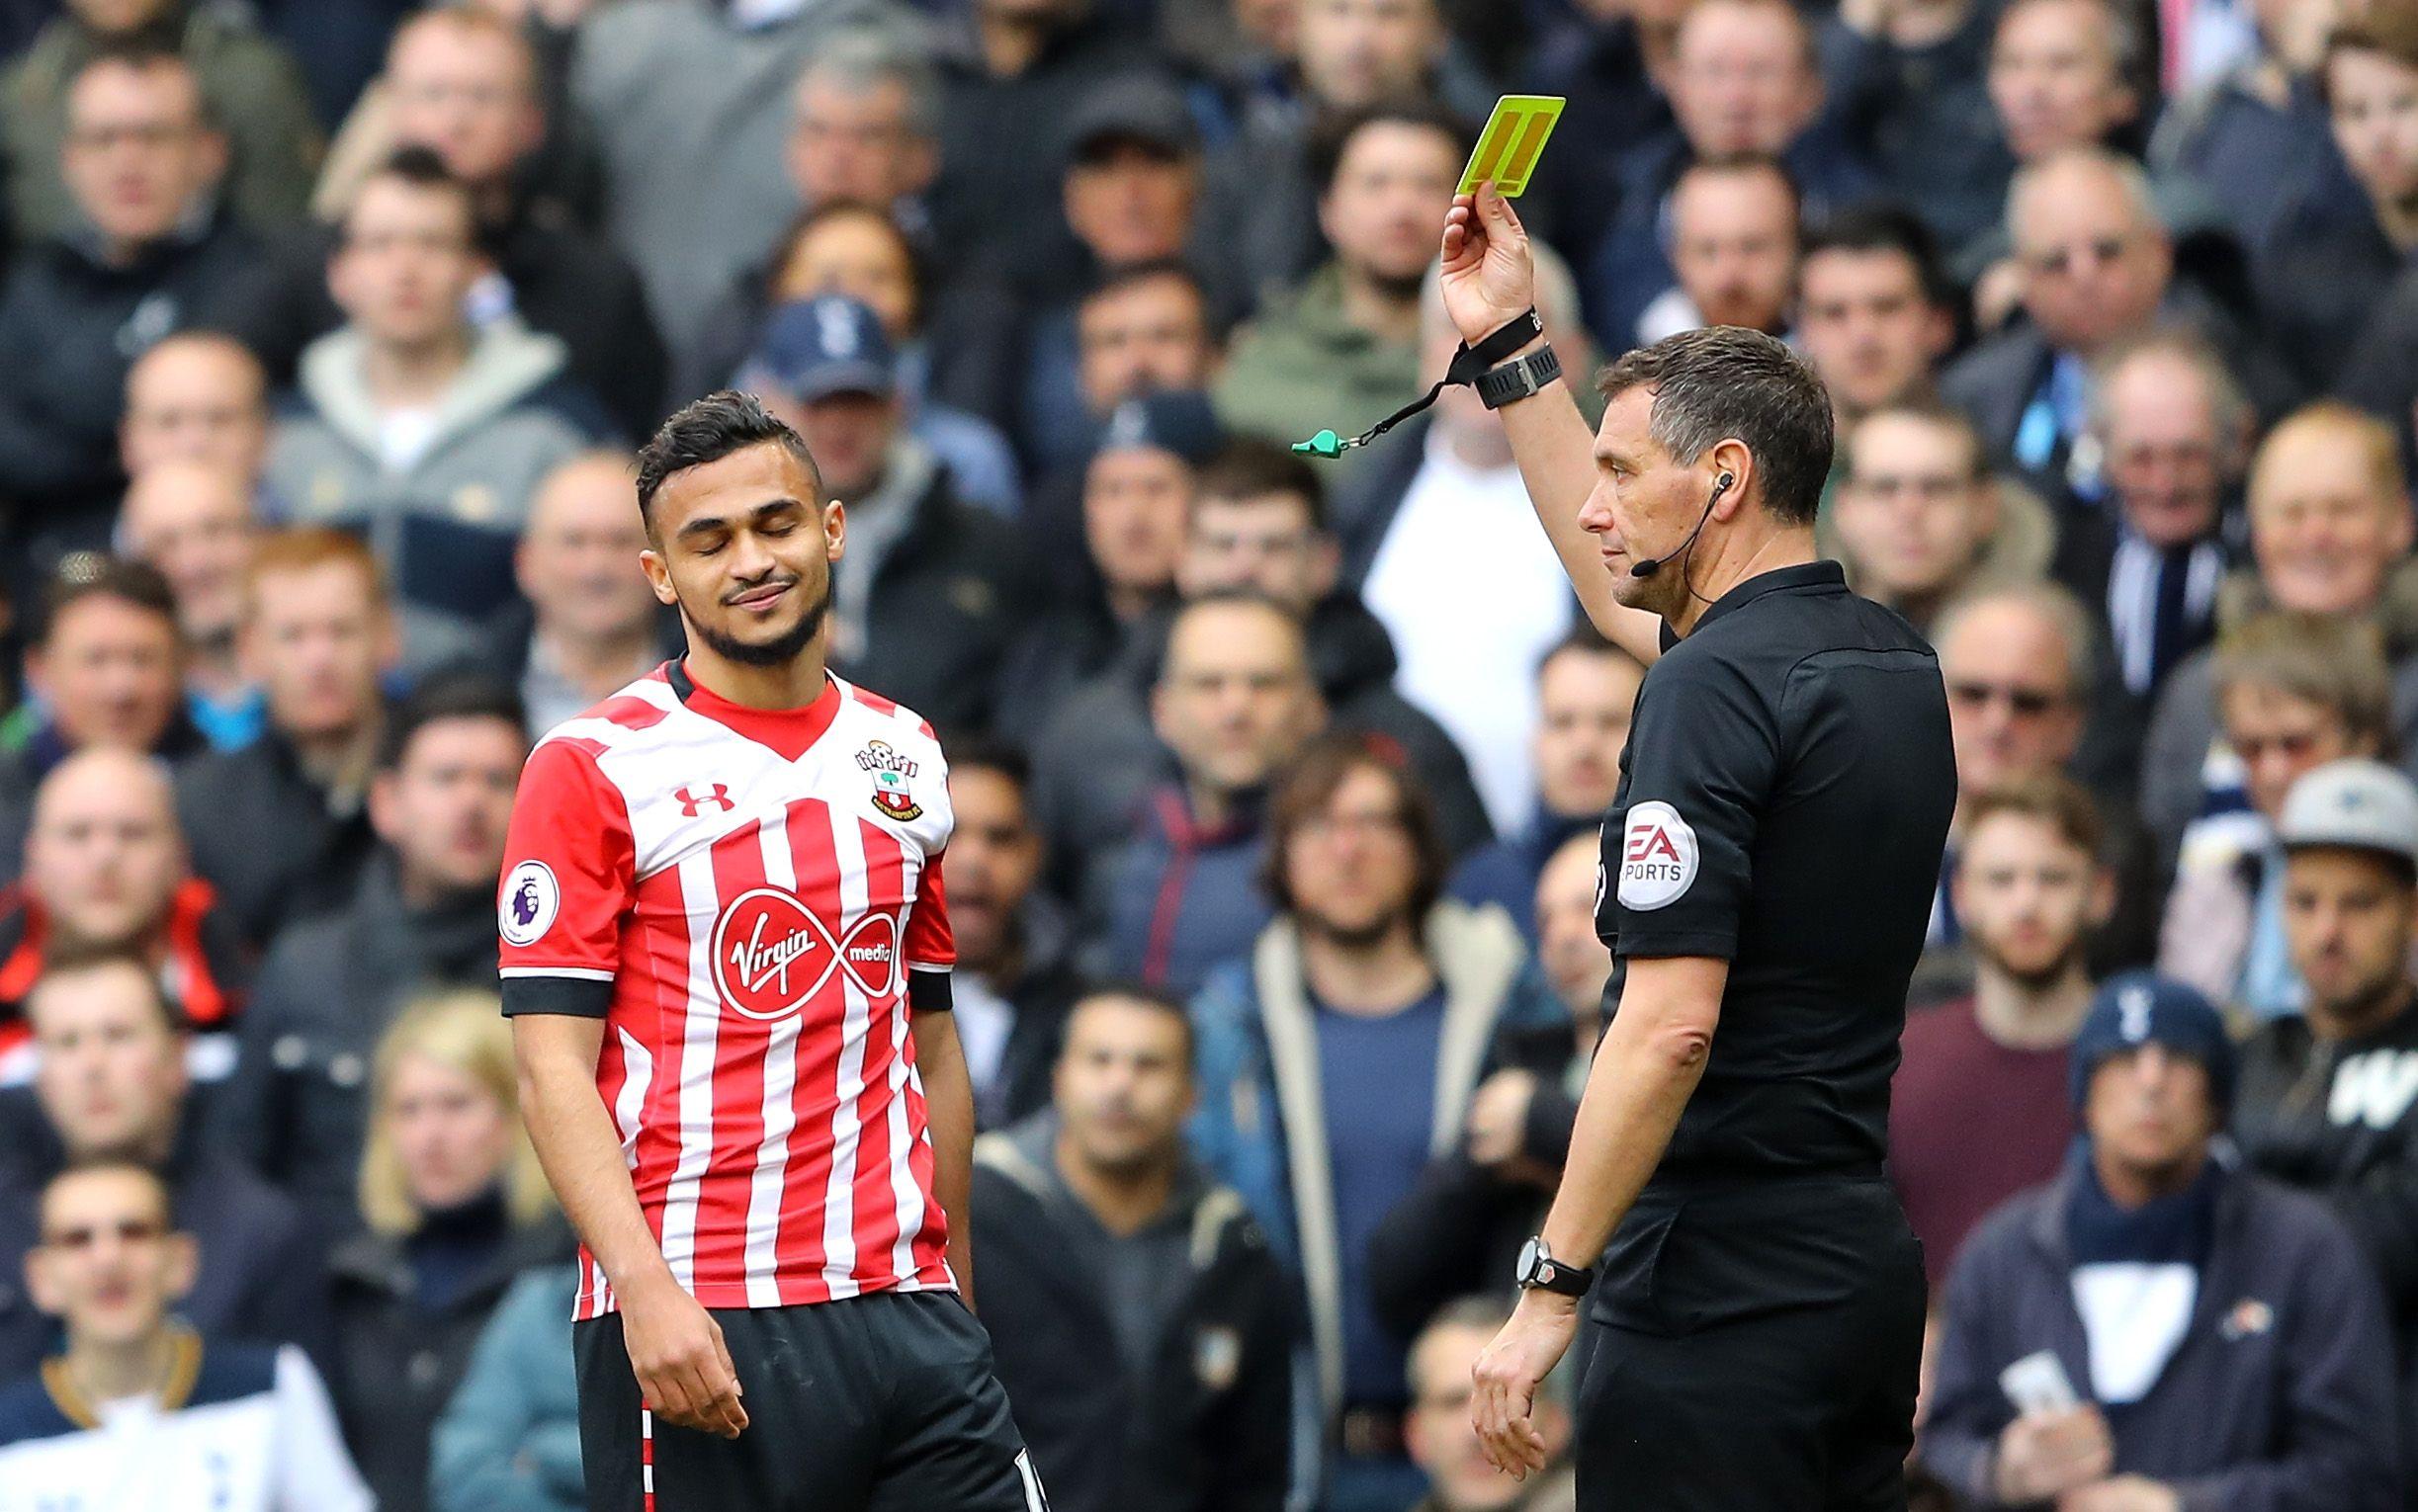 Southampton FC's Sofiane Boufal, left.